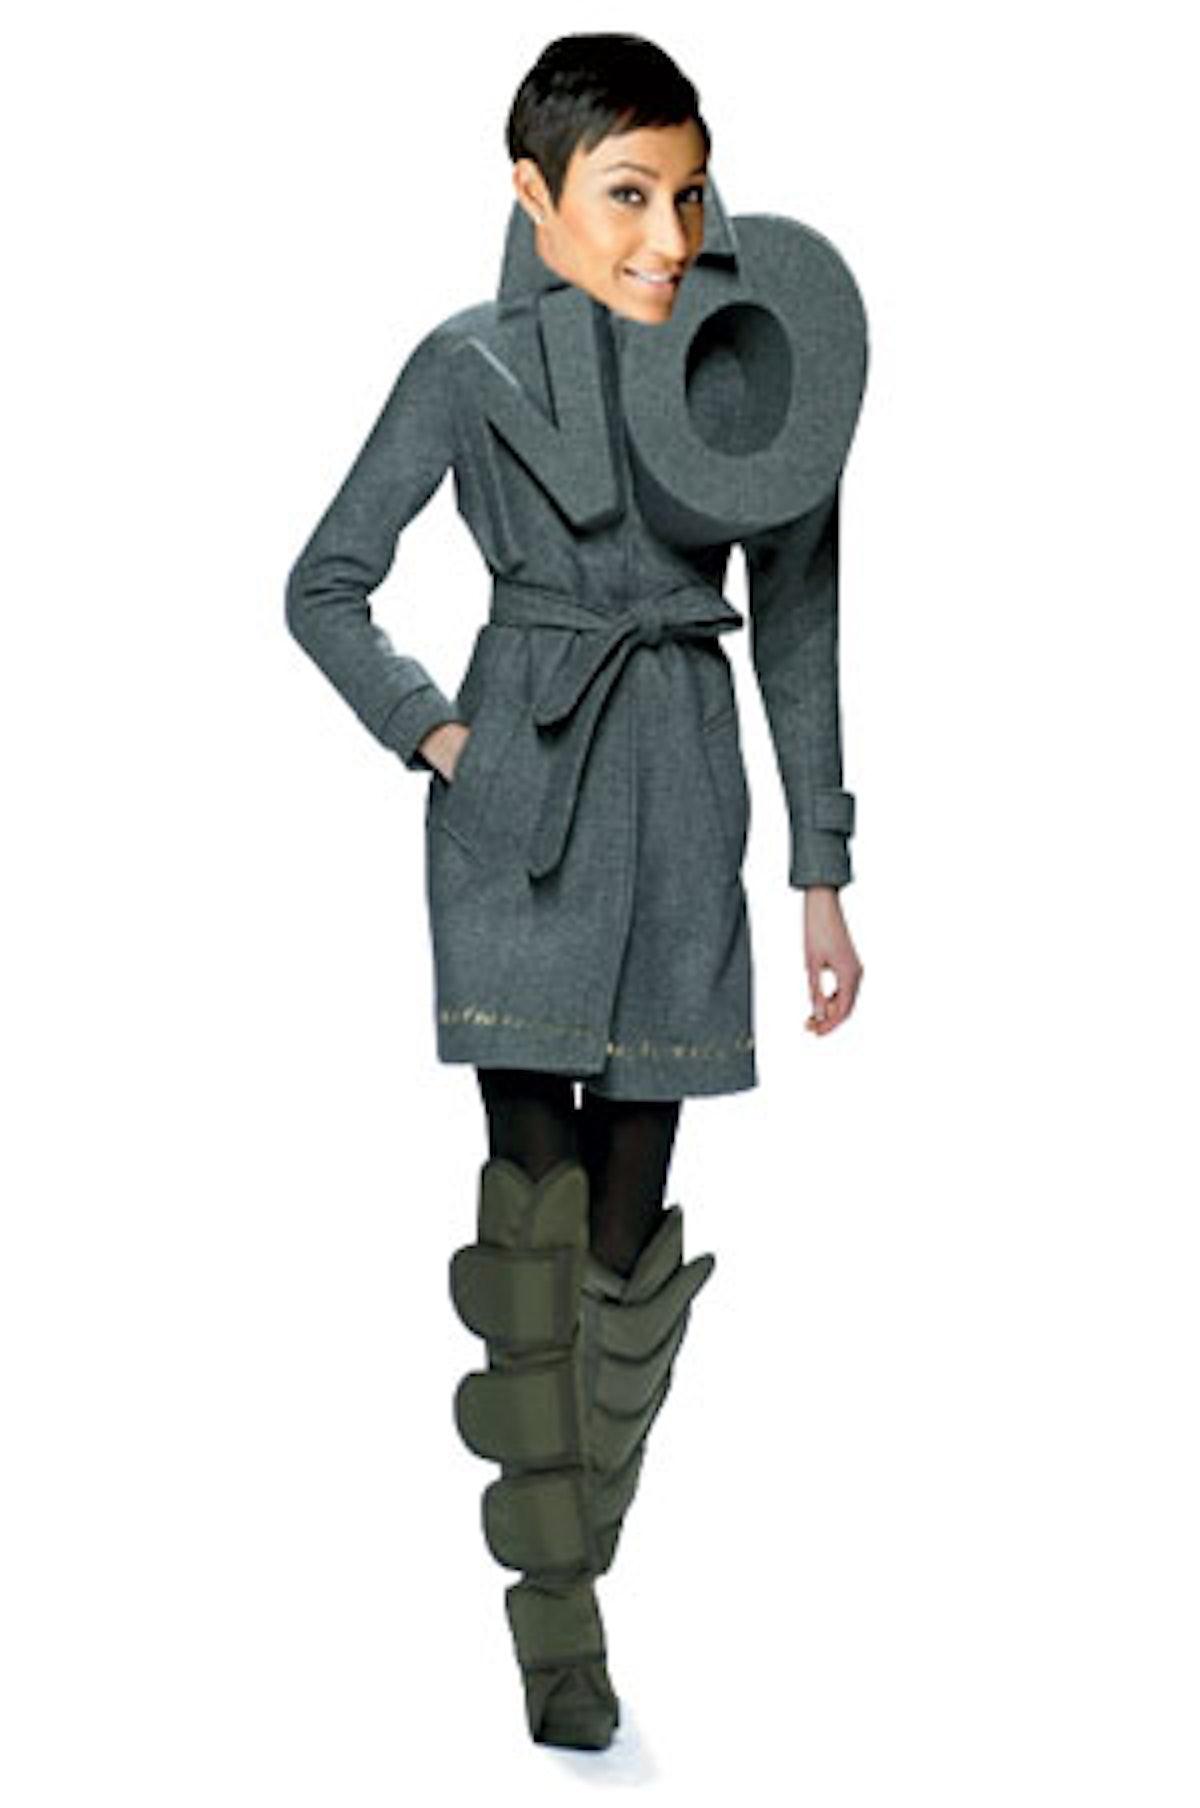 soar_dc_fashion_v1.jpg